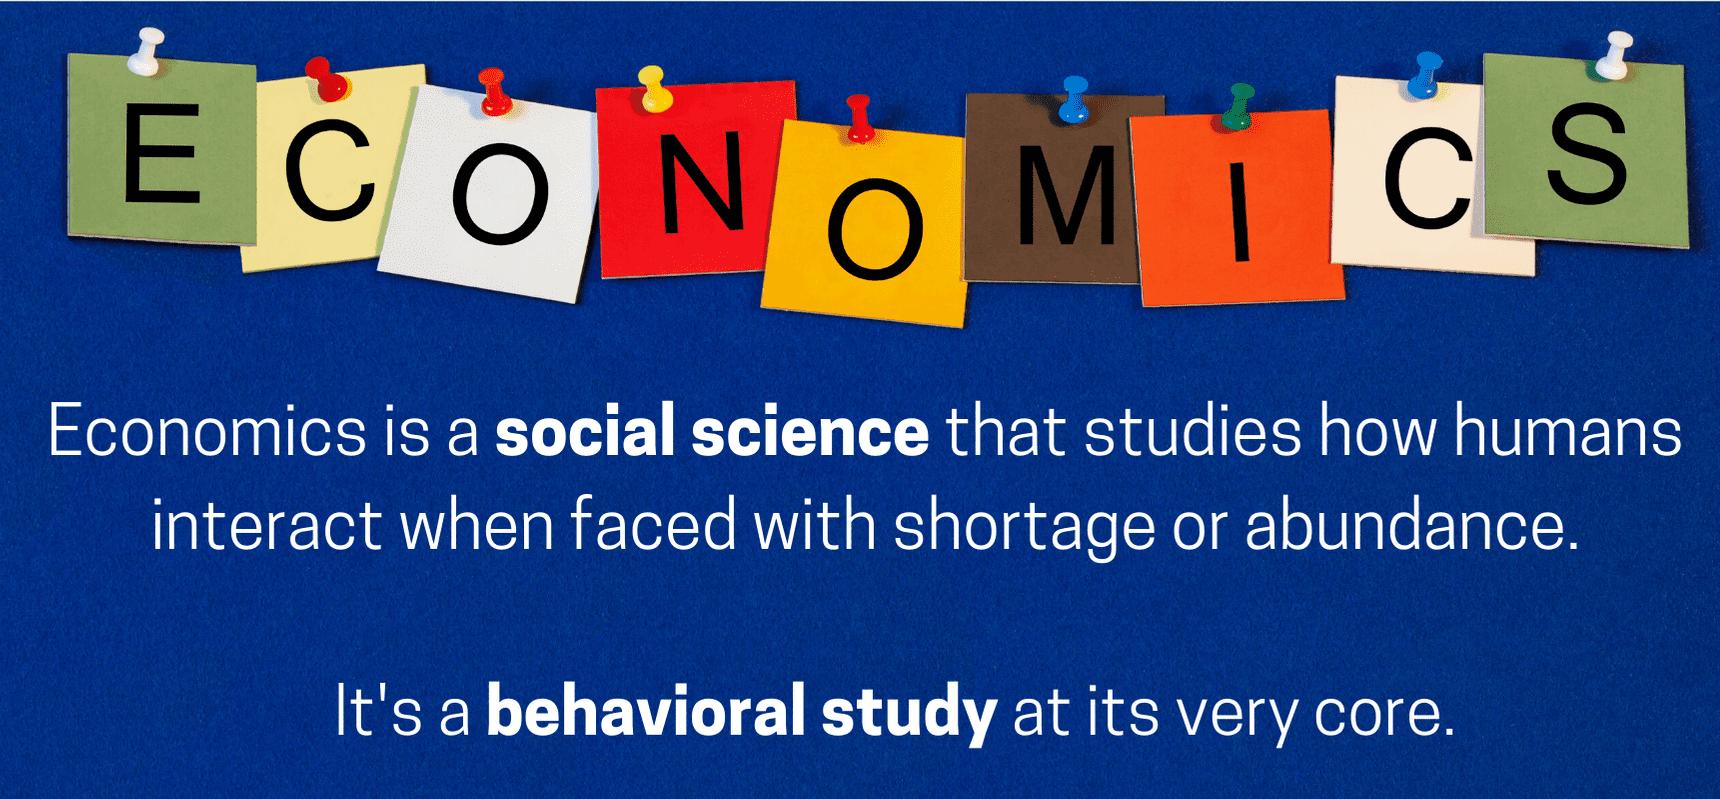 macroeconomics course fact 3